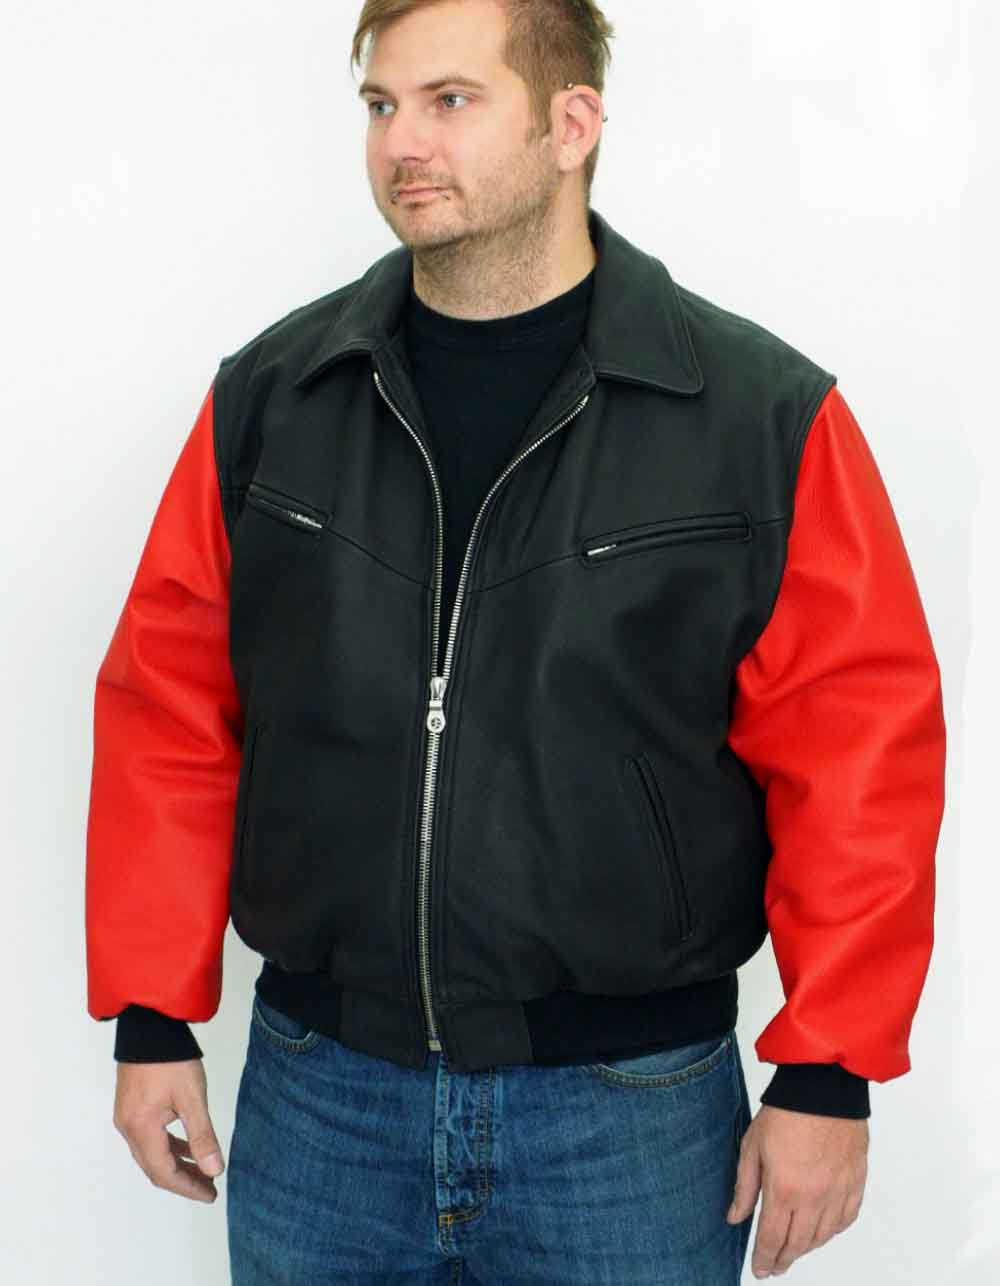 Motorcycle Jackets leather Mod. Flieger Jacke